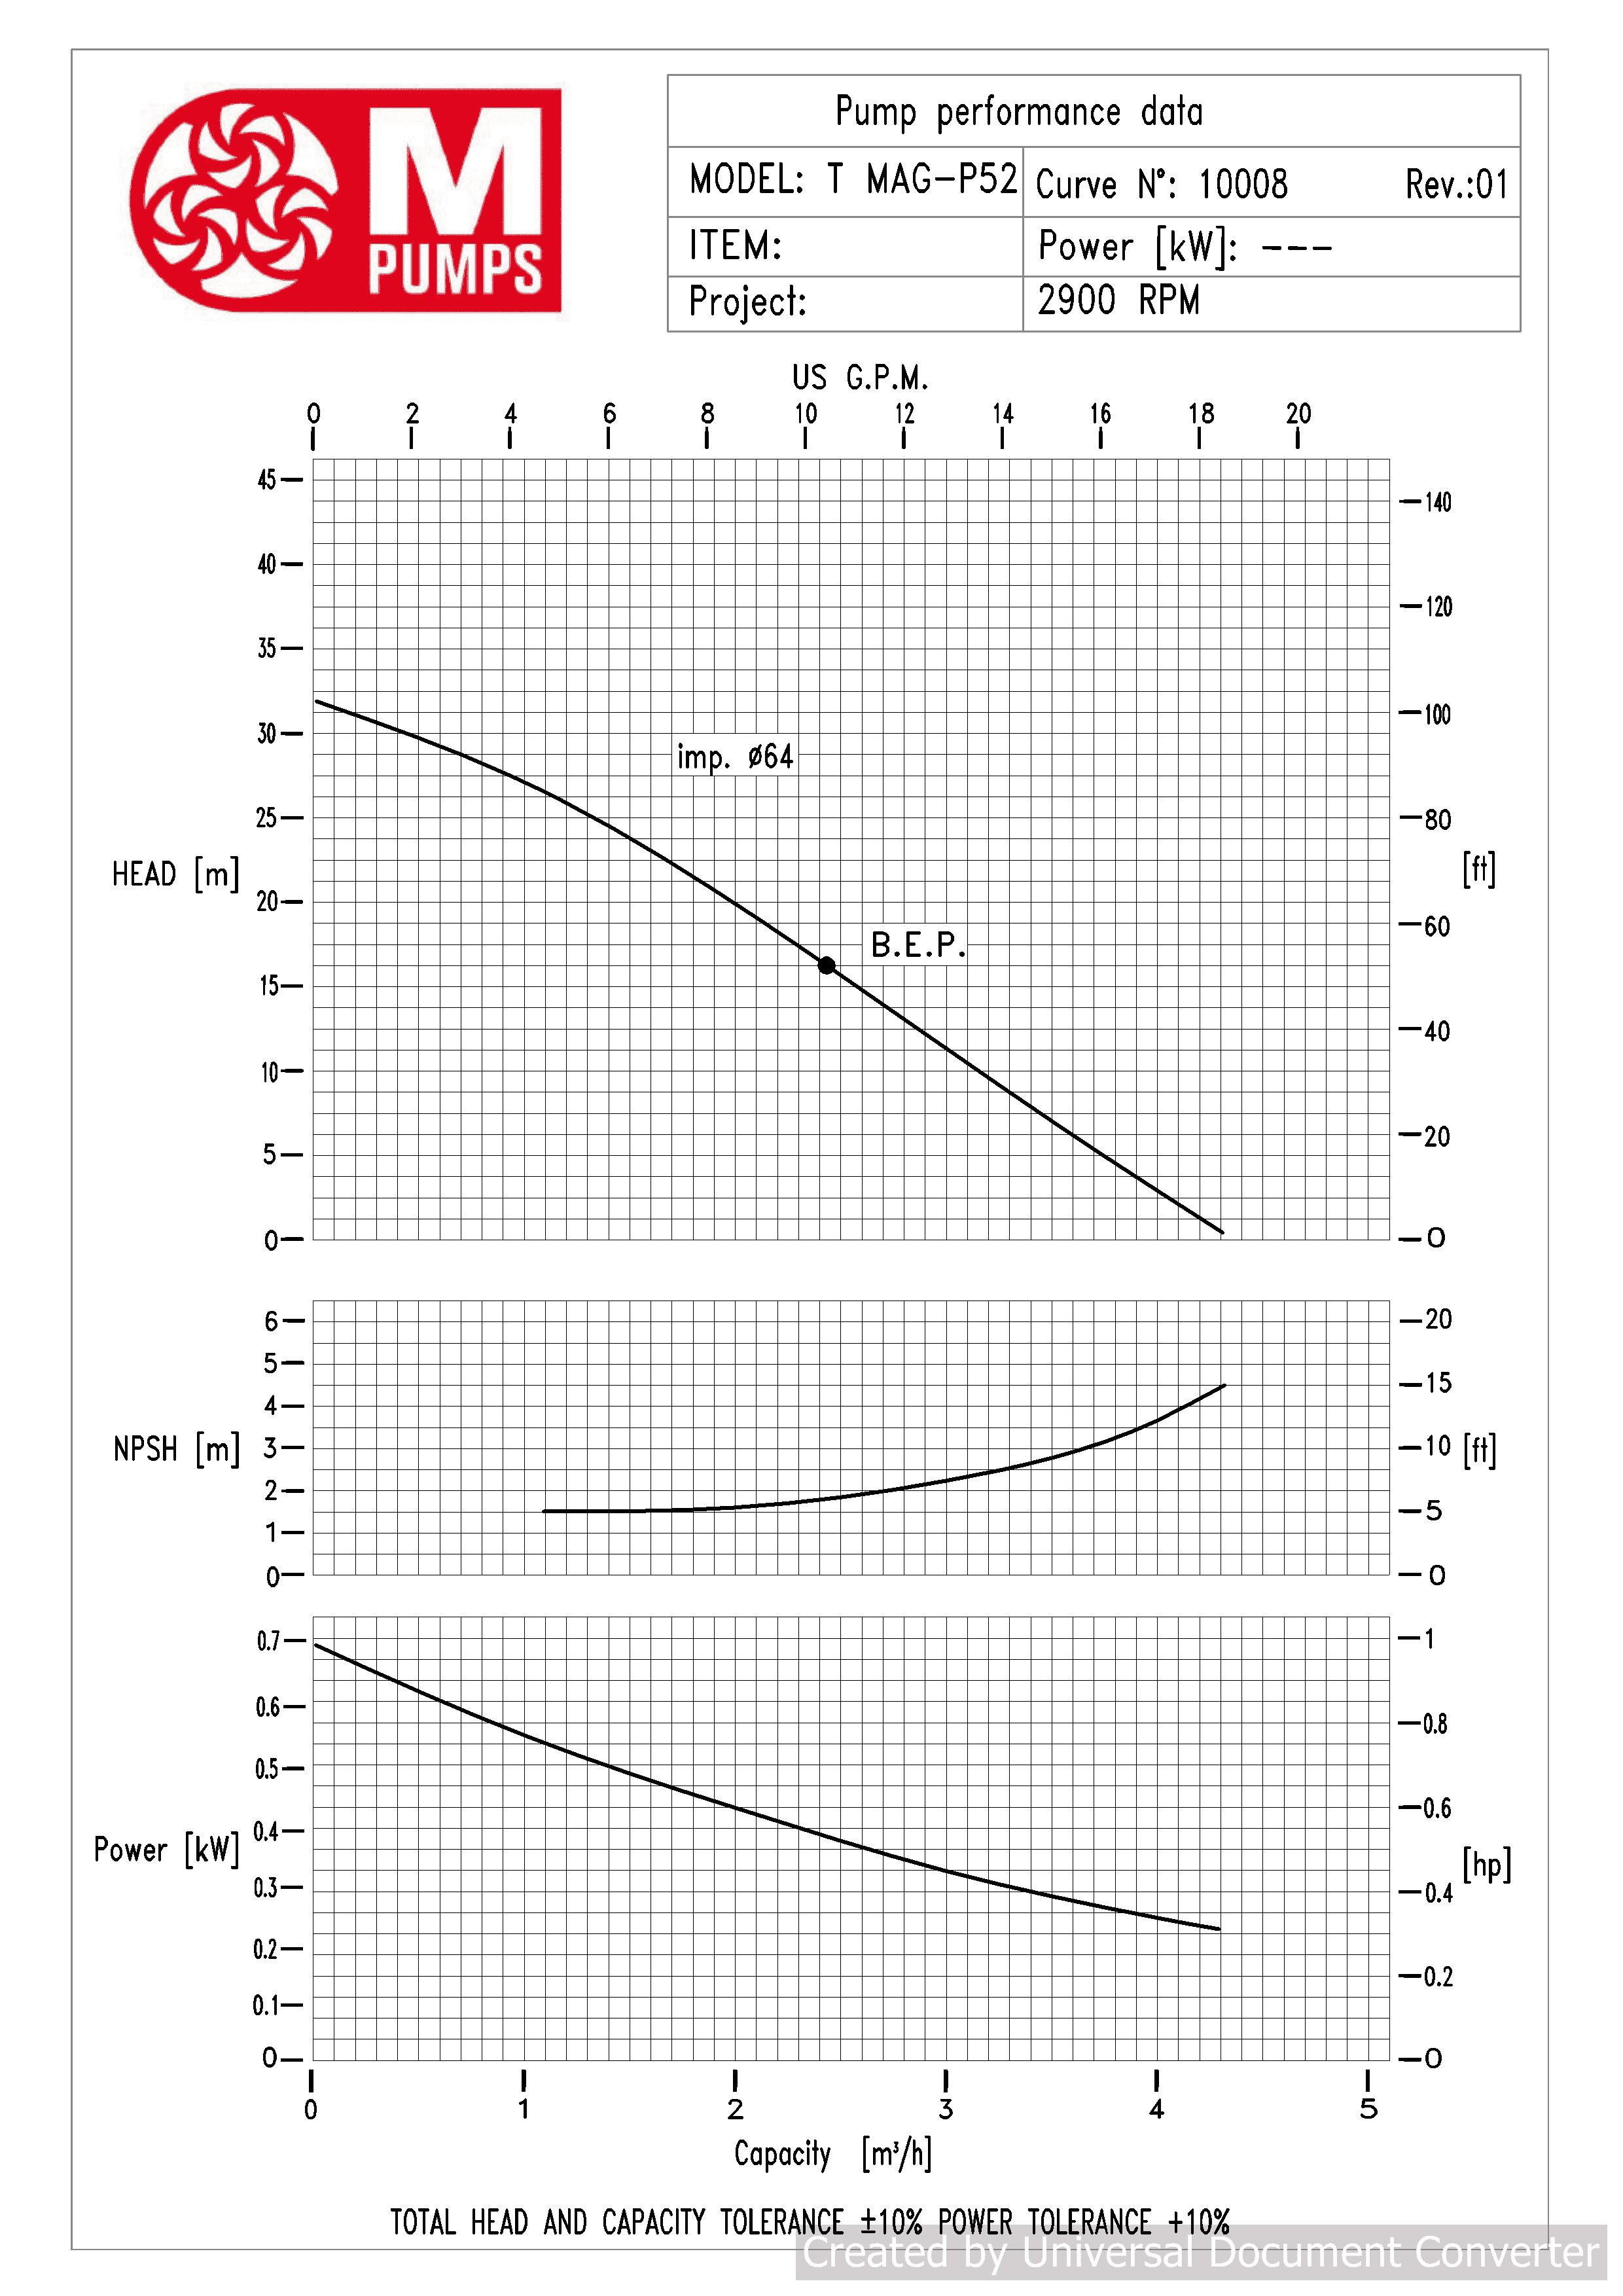 кривая t-mag-p-52